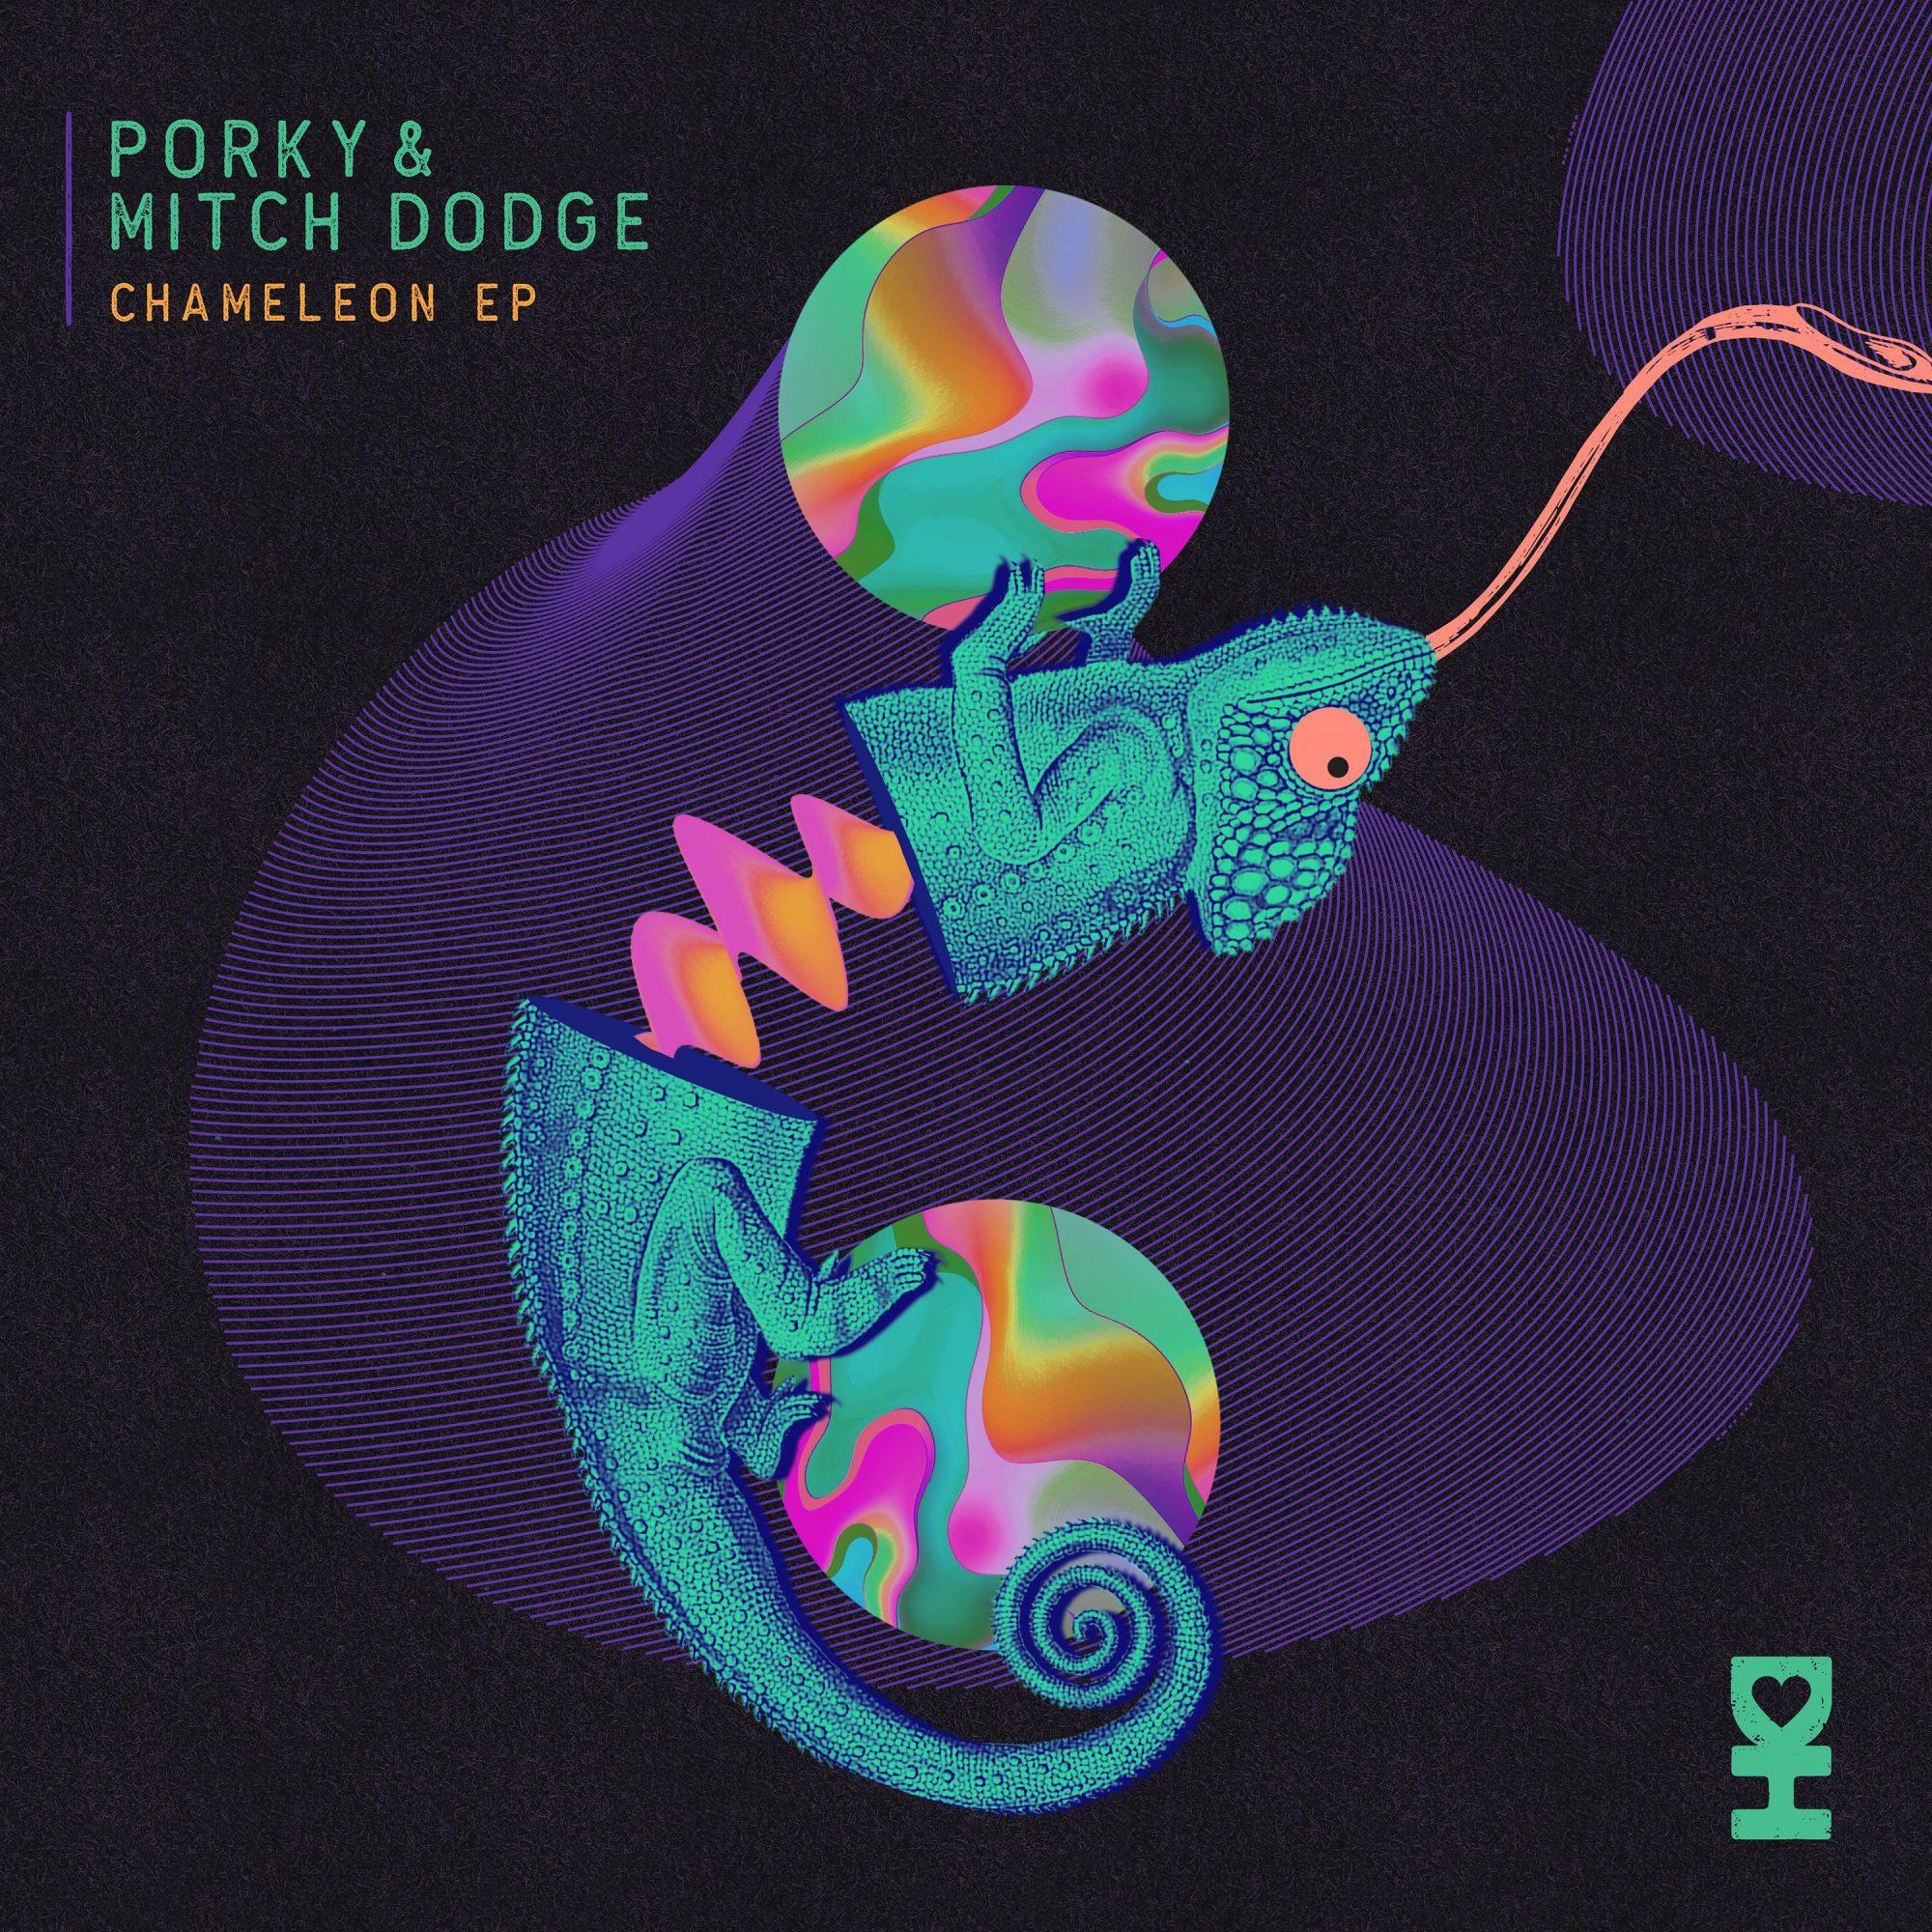 Porky & Mitch Dodge Chameleon EP Desert Hearts